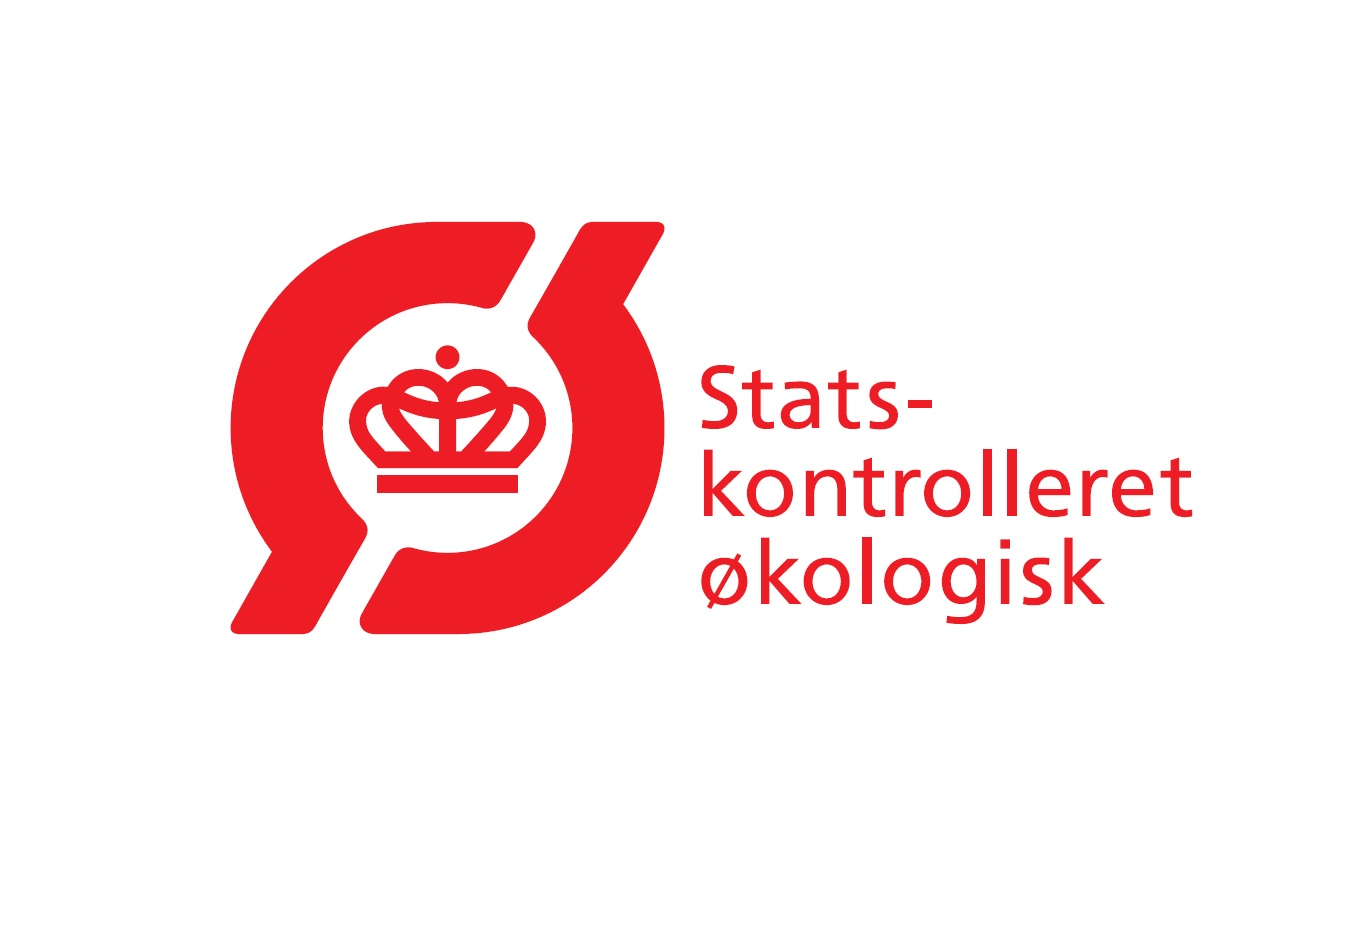 logo_statskontrolleret_oekologisk_roedt_jpg_0.jpg